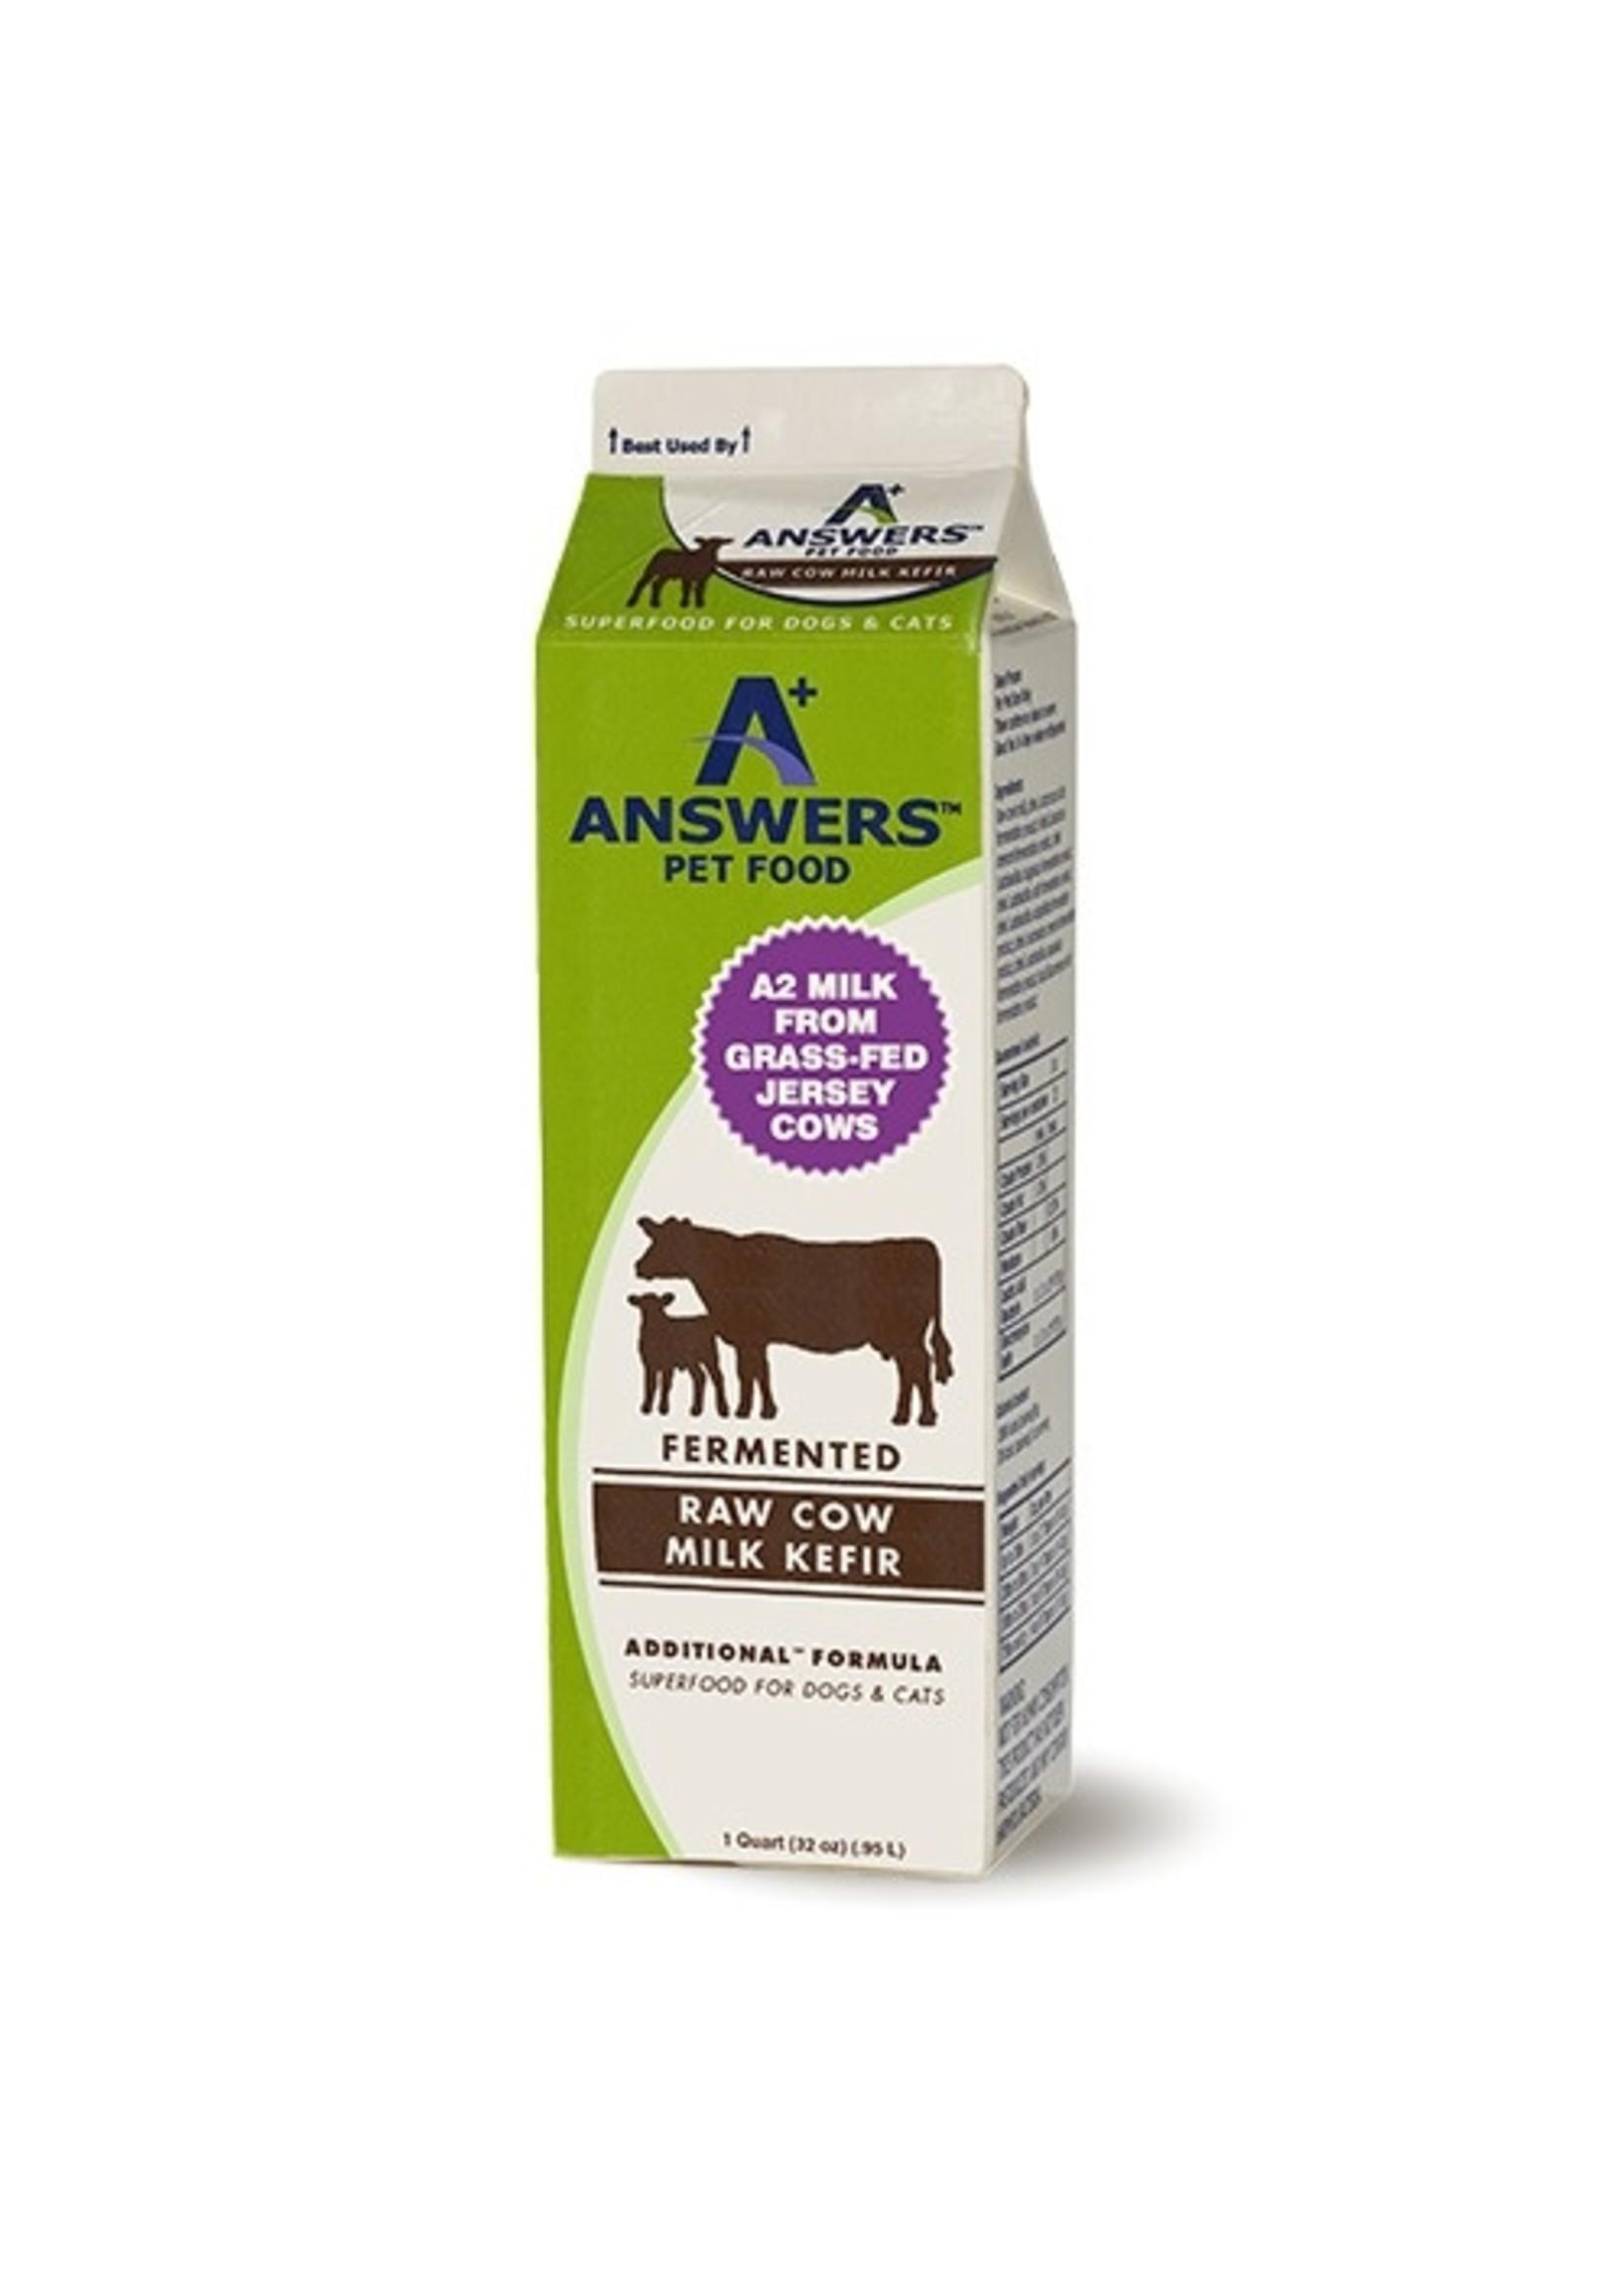 ANSWERS Answers Raw Cow Milk Kefir